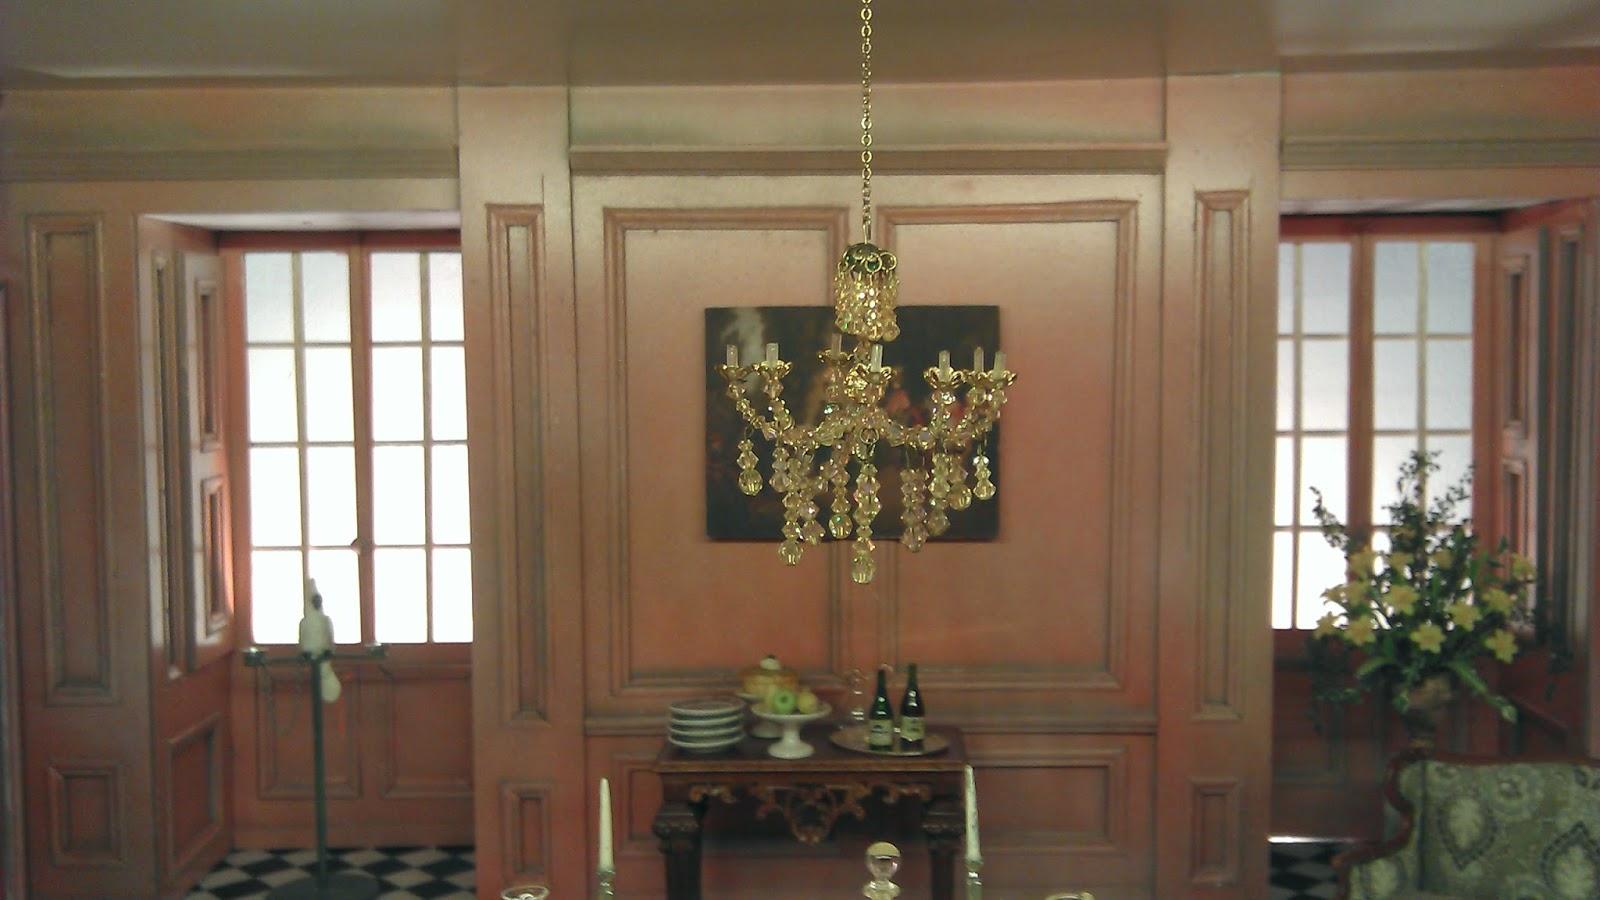 patrick duclou miniatures la salle a manger. Black Bedroom Furniture Sets. Home Design Ideas